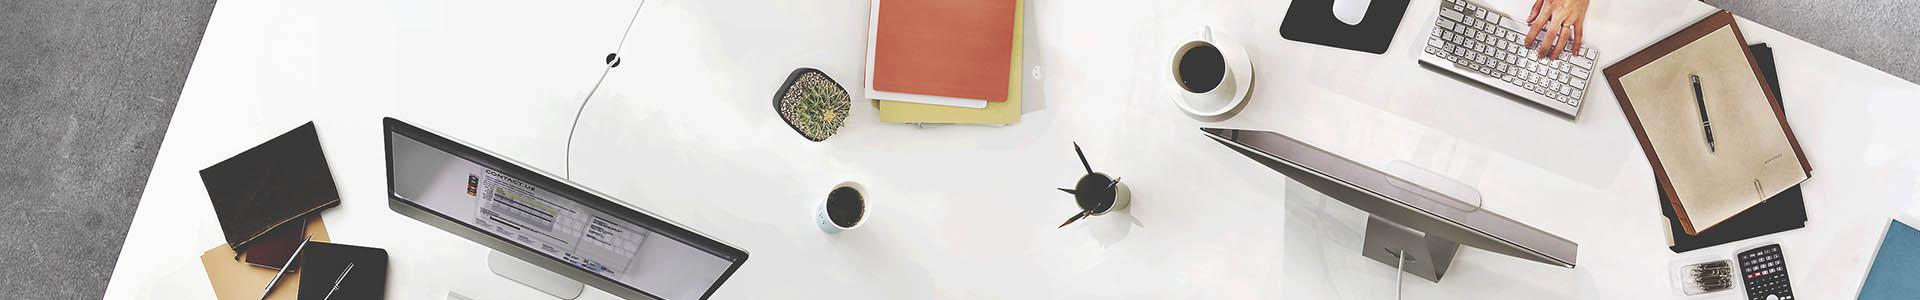 Escritorio con computadoras, libros, cuadernos, manos, vistas desde arriba